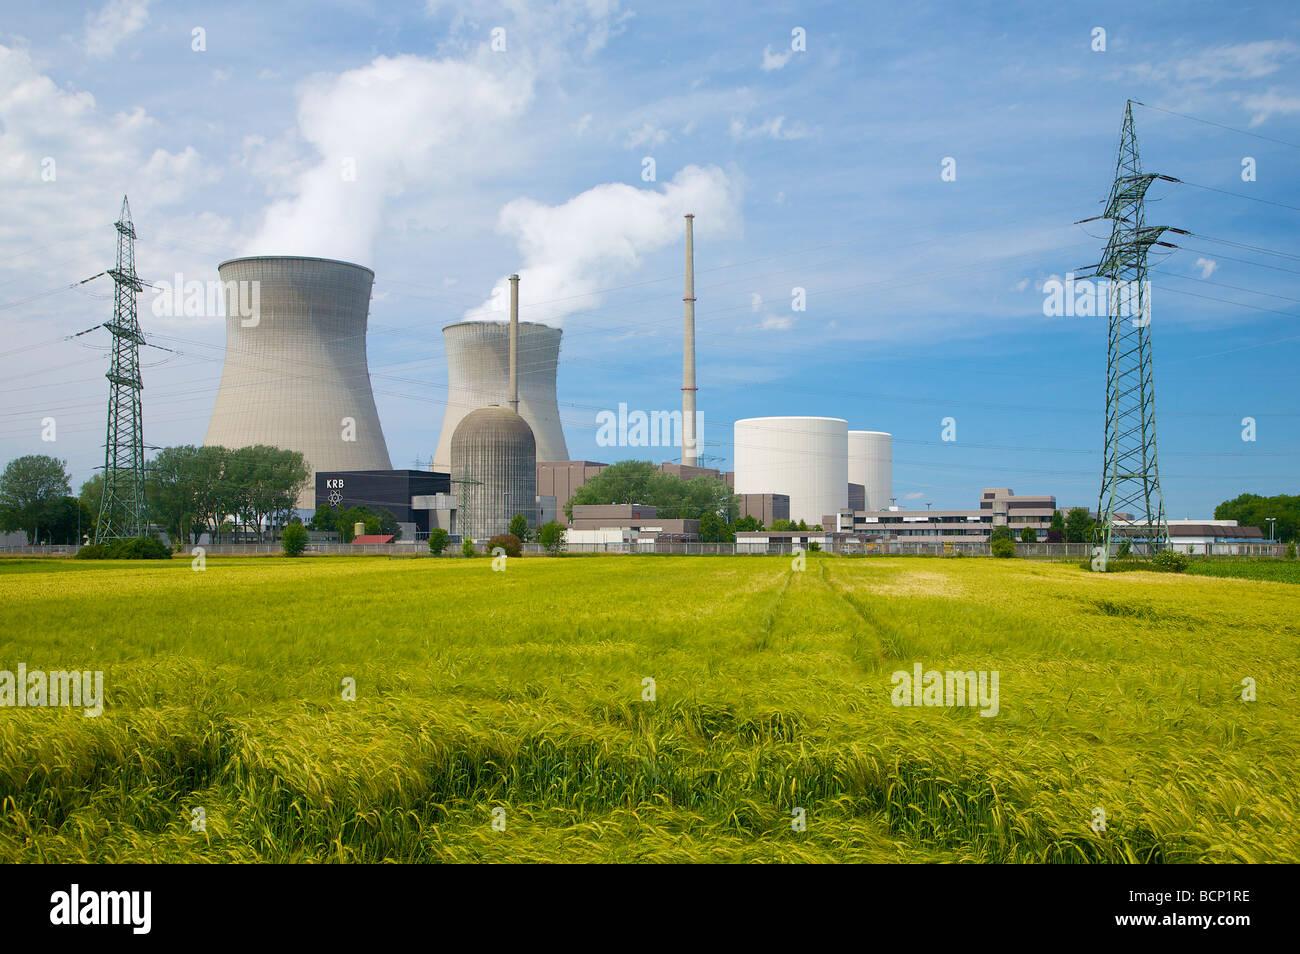 Gundremmingen nuclear power plant in Bavaria, Germany. 2 active BWR reactors. Kernkraftwerk Gundremmingen, Bayern, - Stock Image